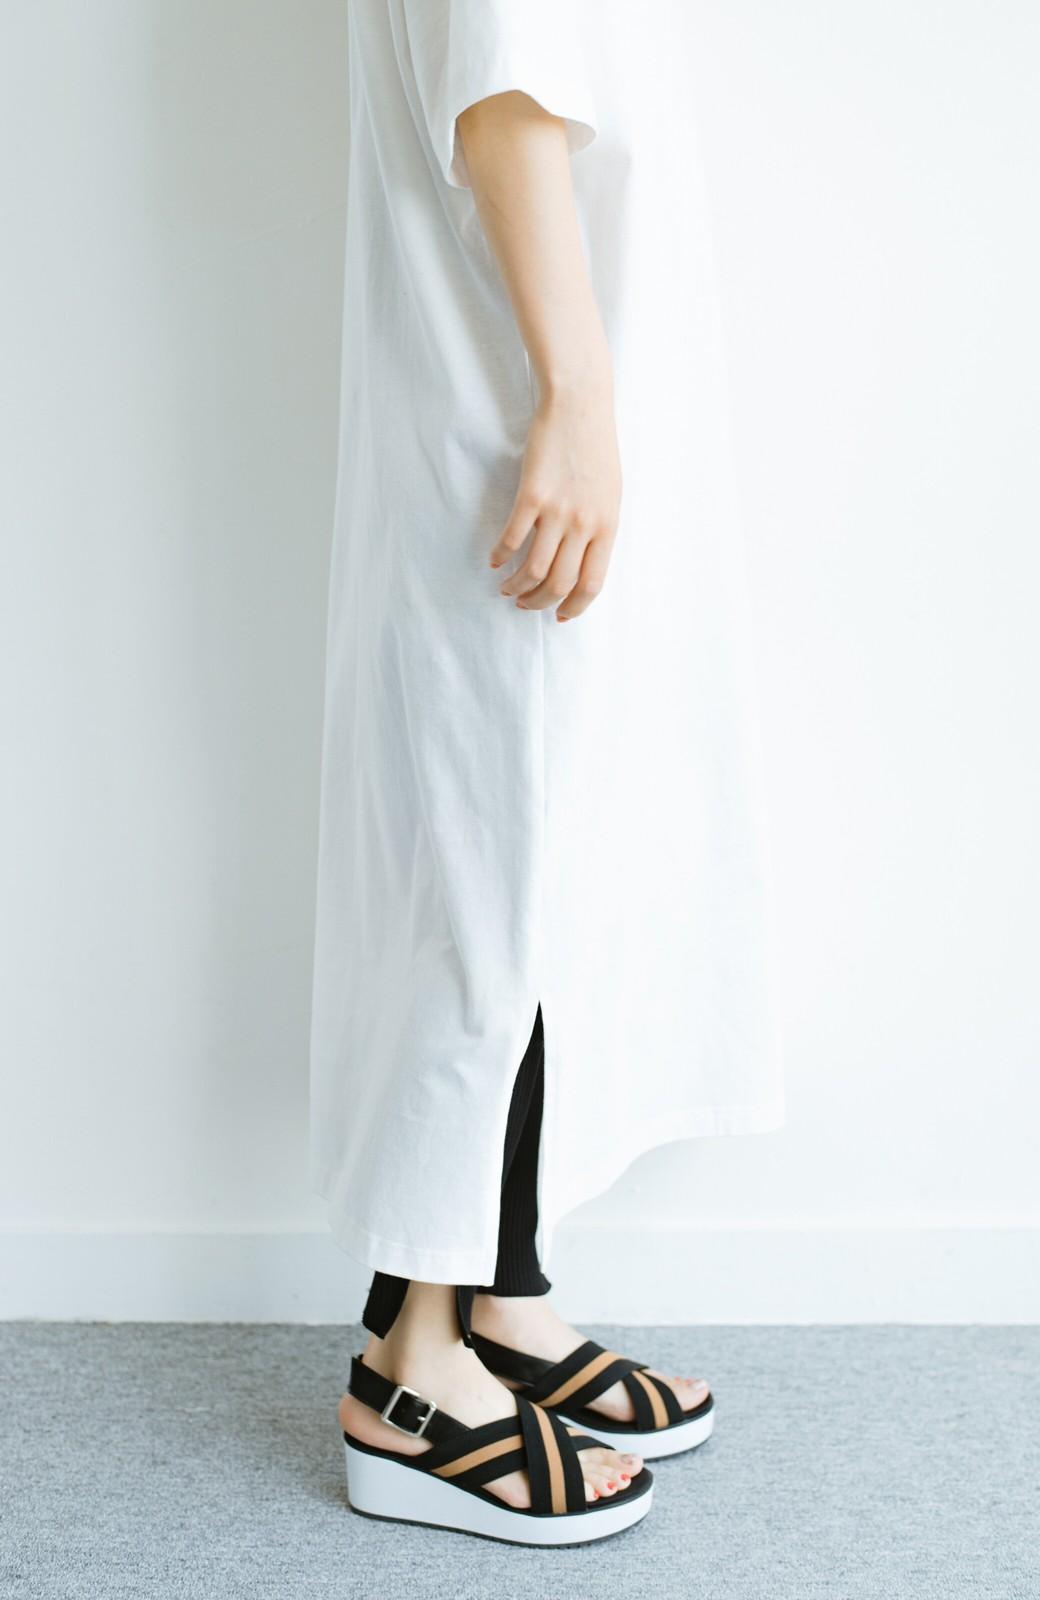 haco! 【ずぼら党】すぽっと着るだけ即完成! ずぼらさんのための気取らず着られて洗濯機洗いできるワンピ2枚セット <ホワイト×ネイビー>の商品写真10